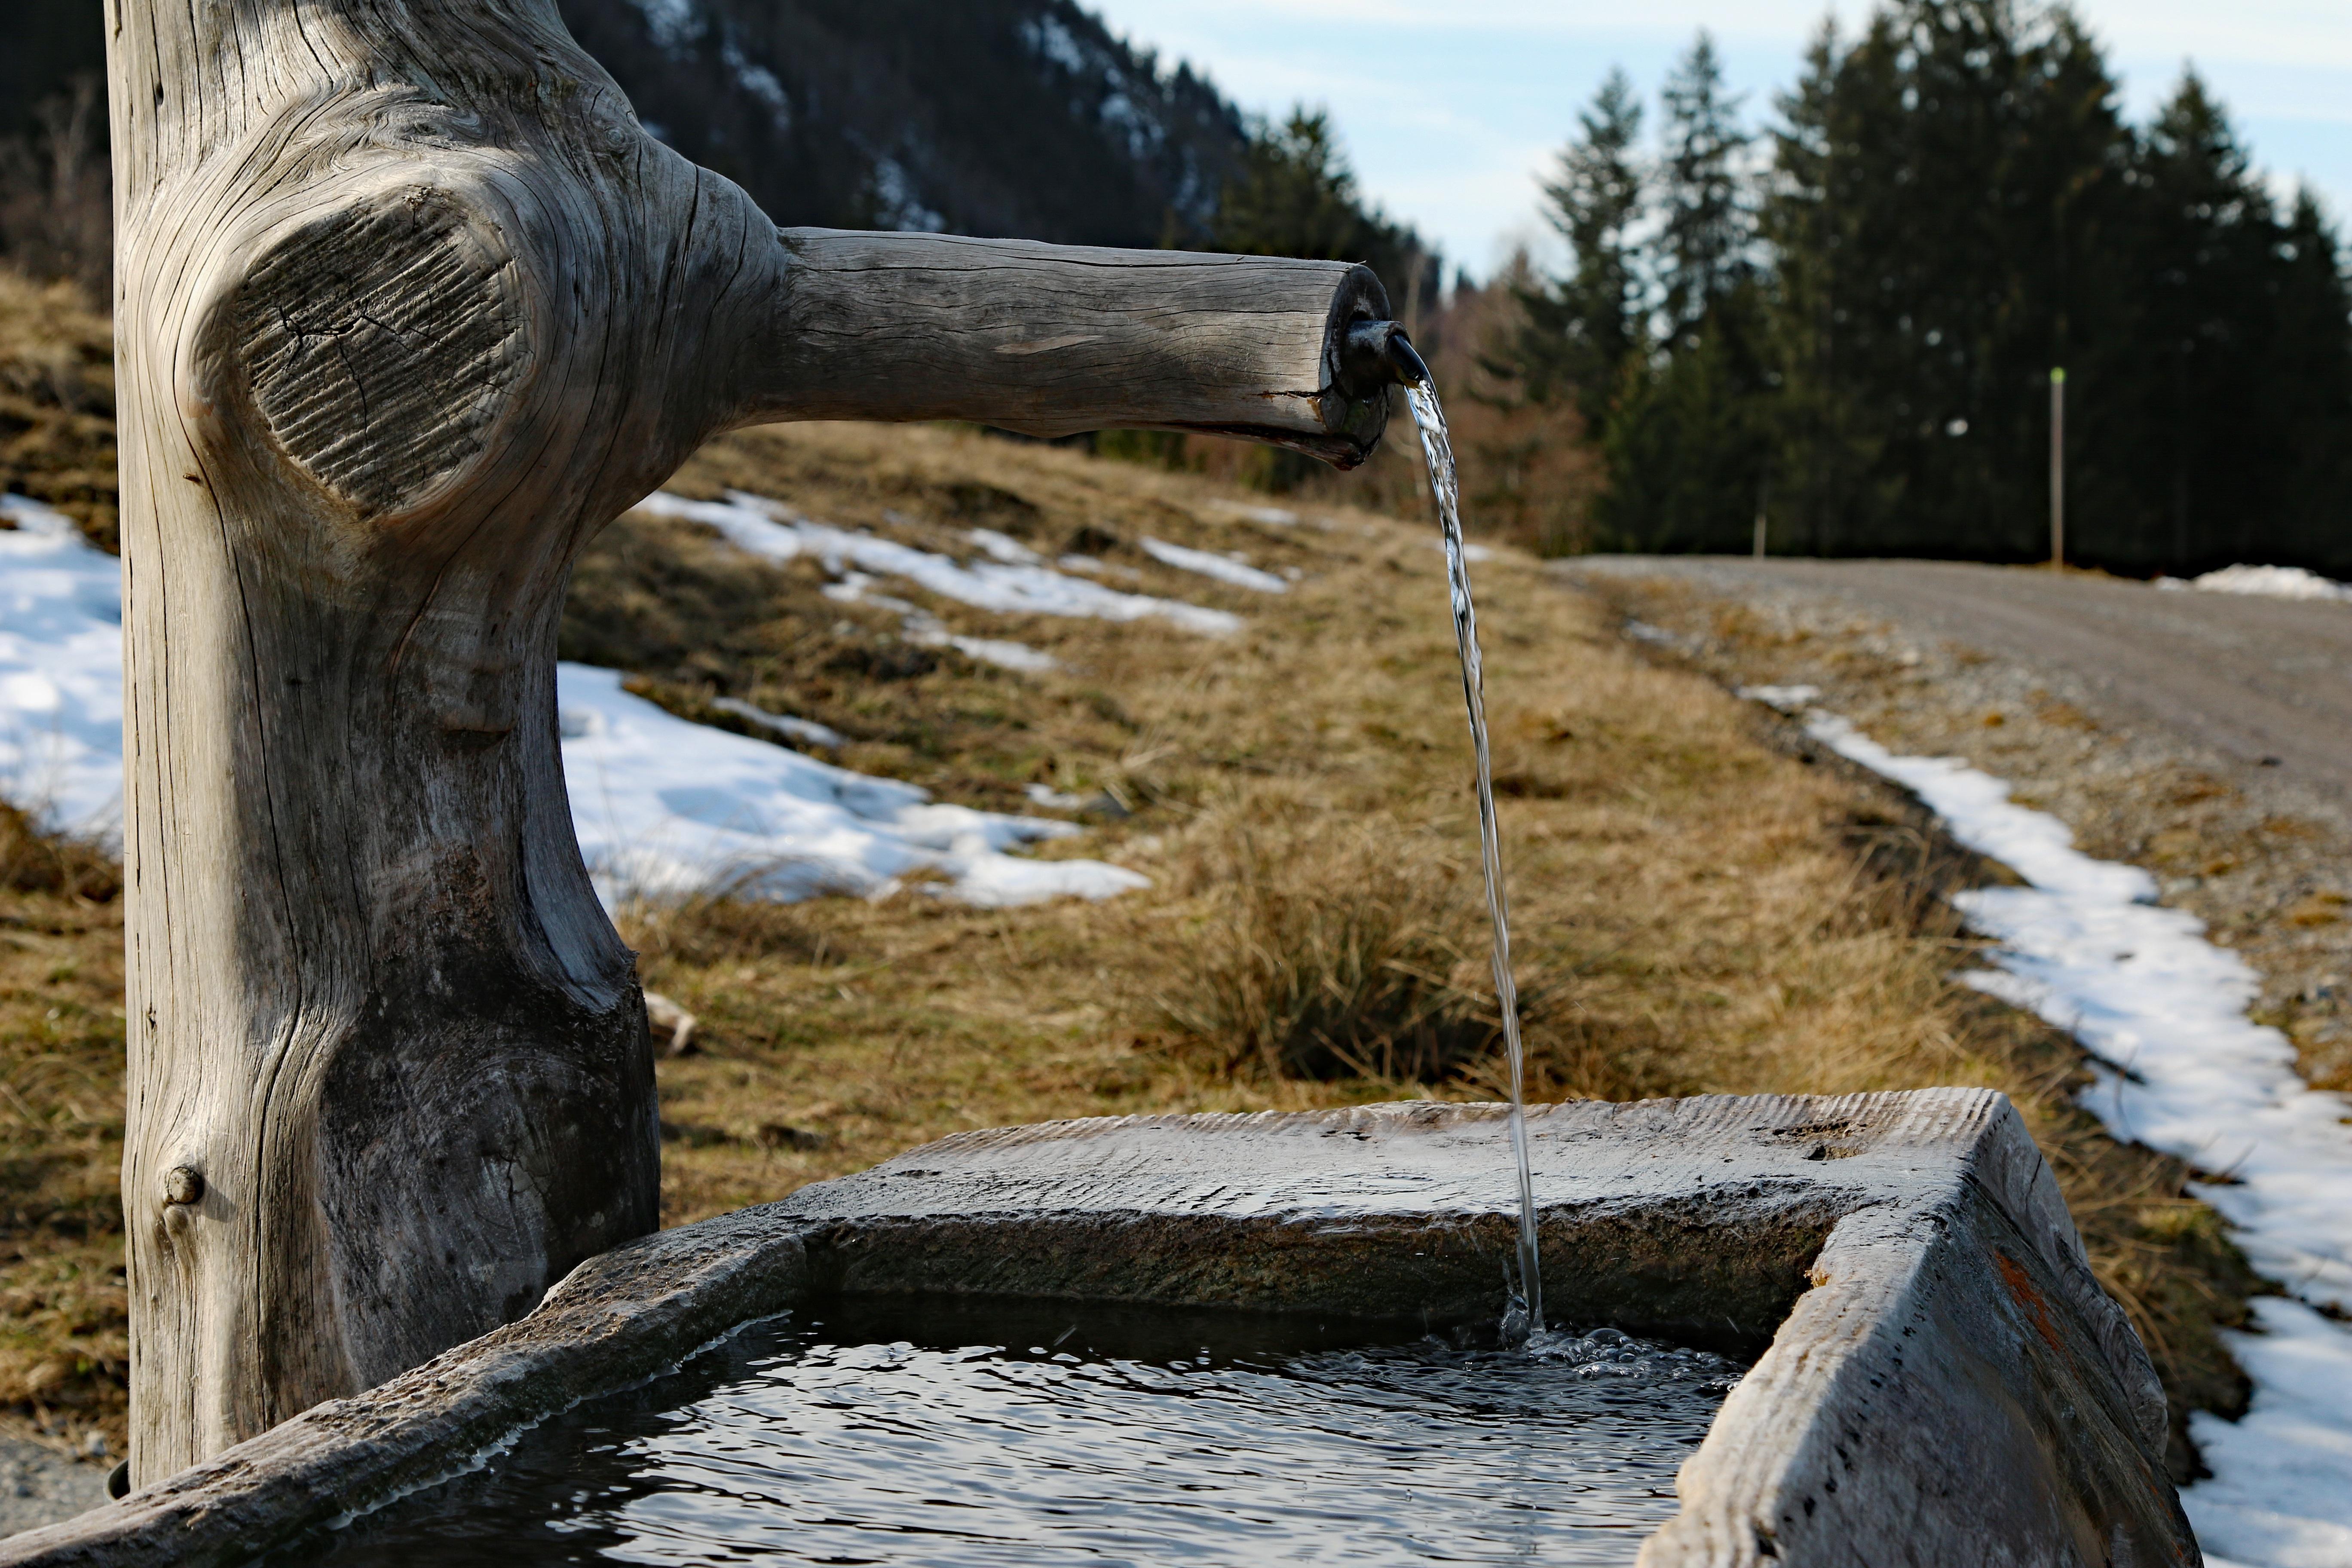 bassin d'eau traduction